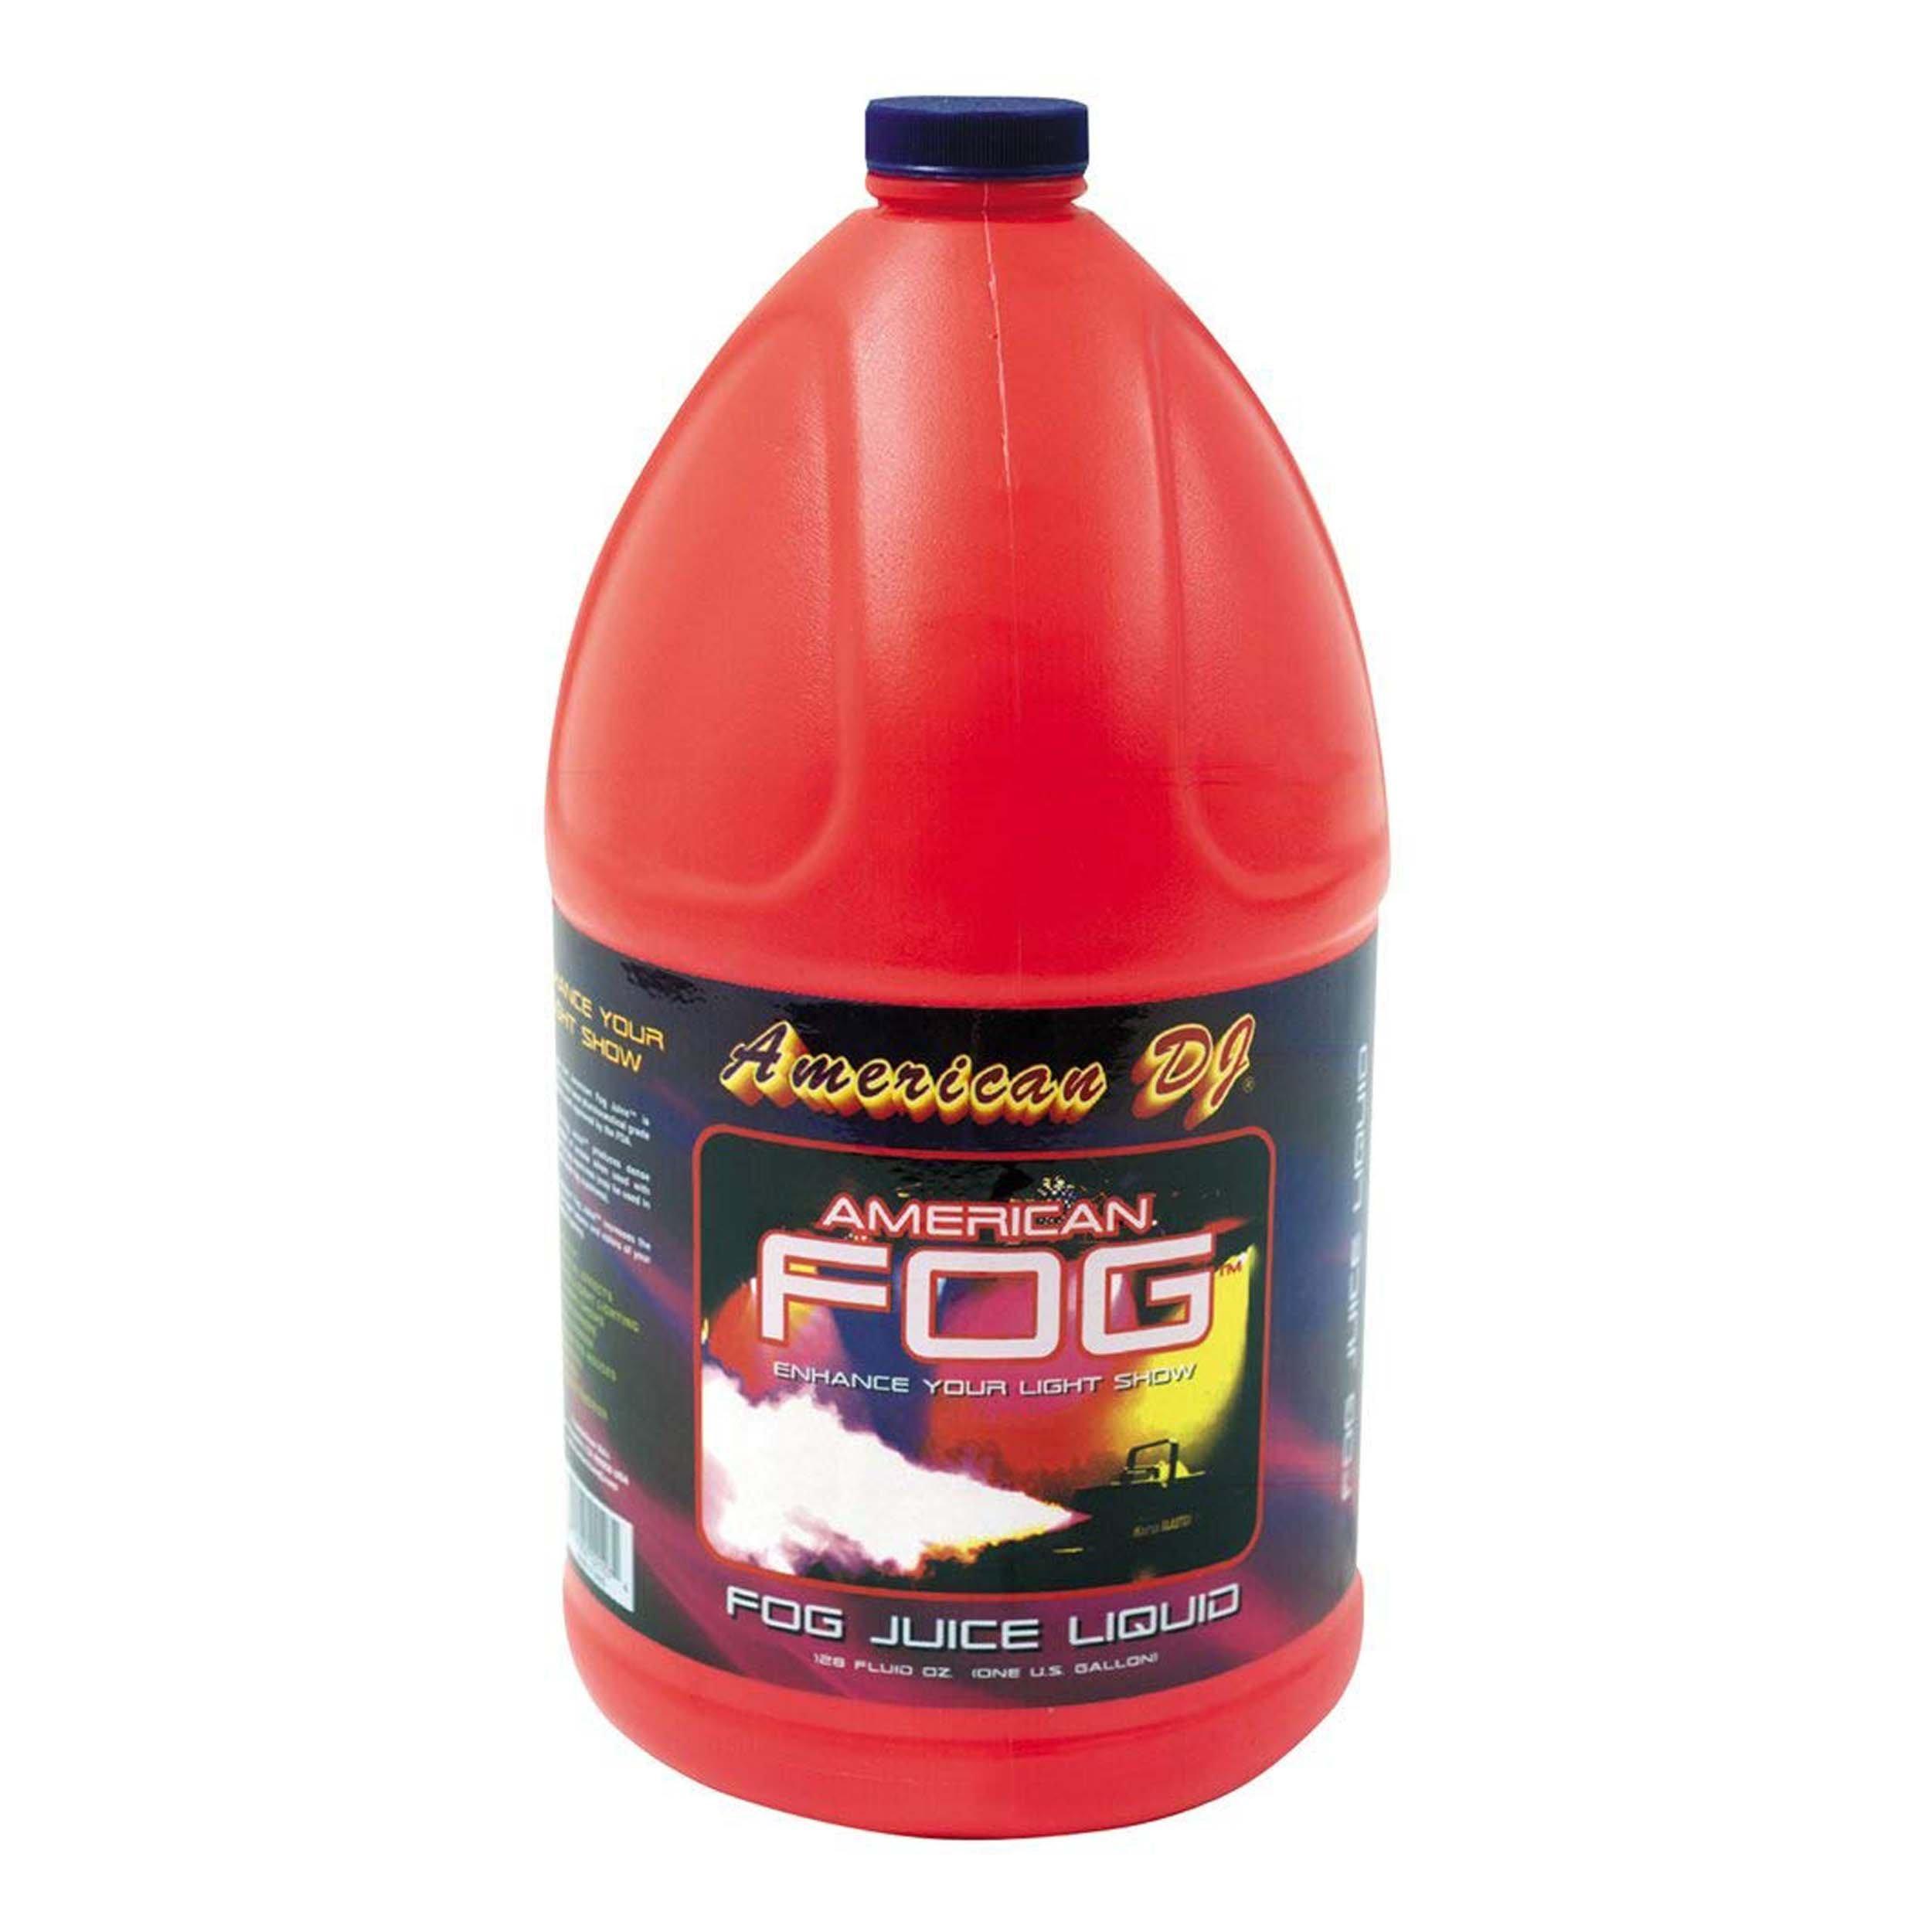 American Dj F-Un/Q Fog Juice - 1 Gallon Water Based Fog Juice by American DJ (Image #1)